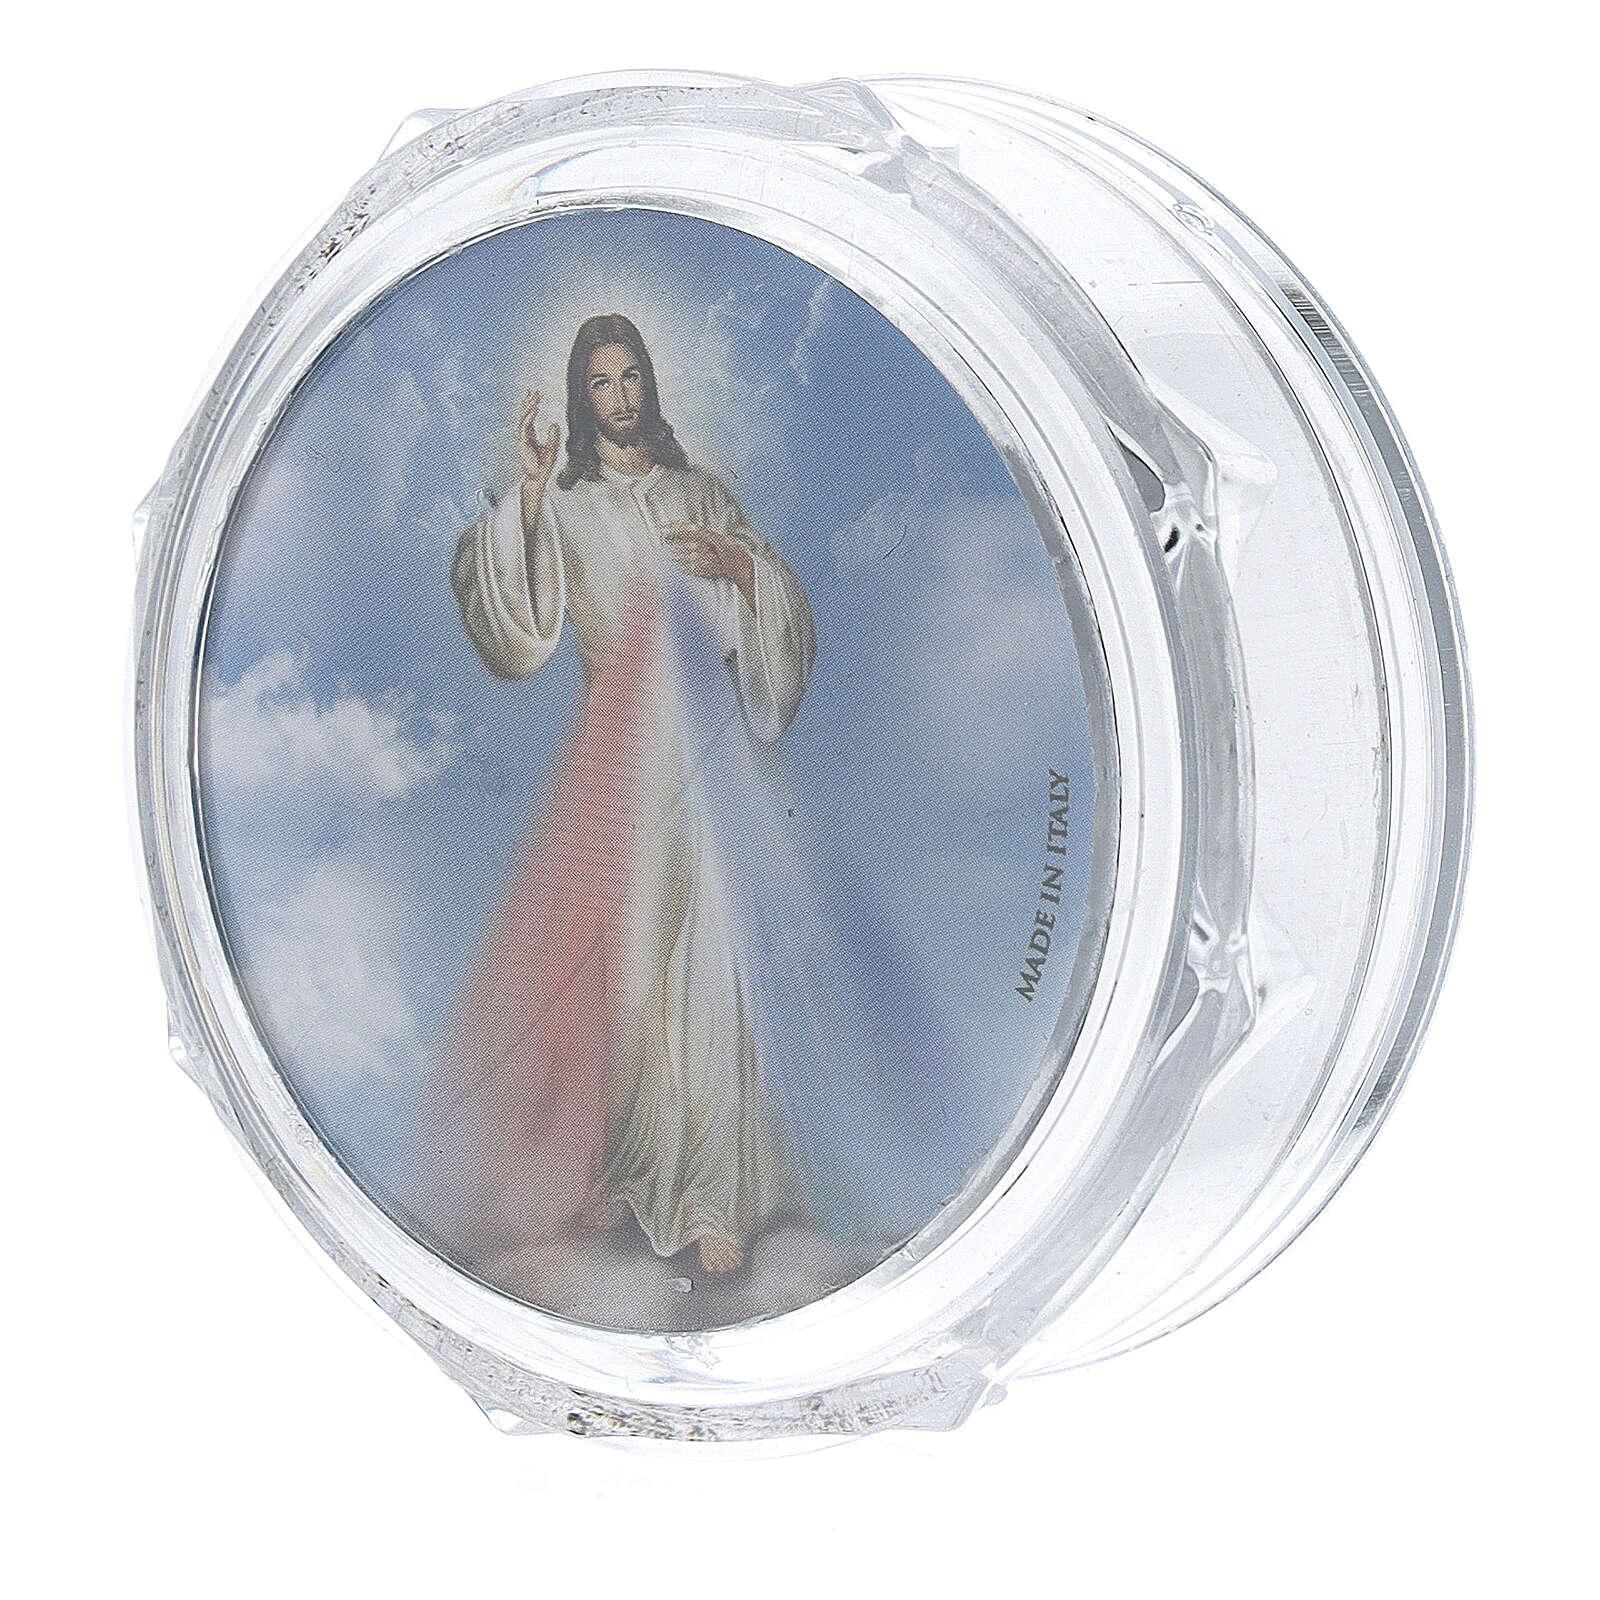 Scatolina portarosario ottagonale Gesù Misericordioso 4